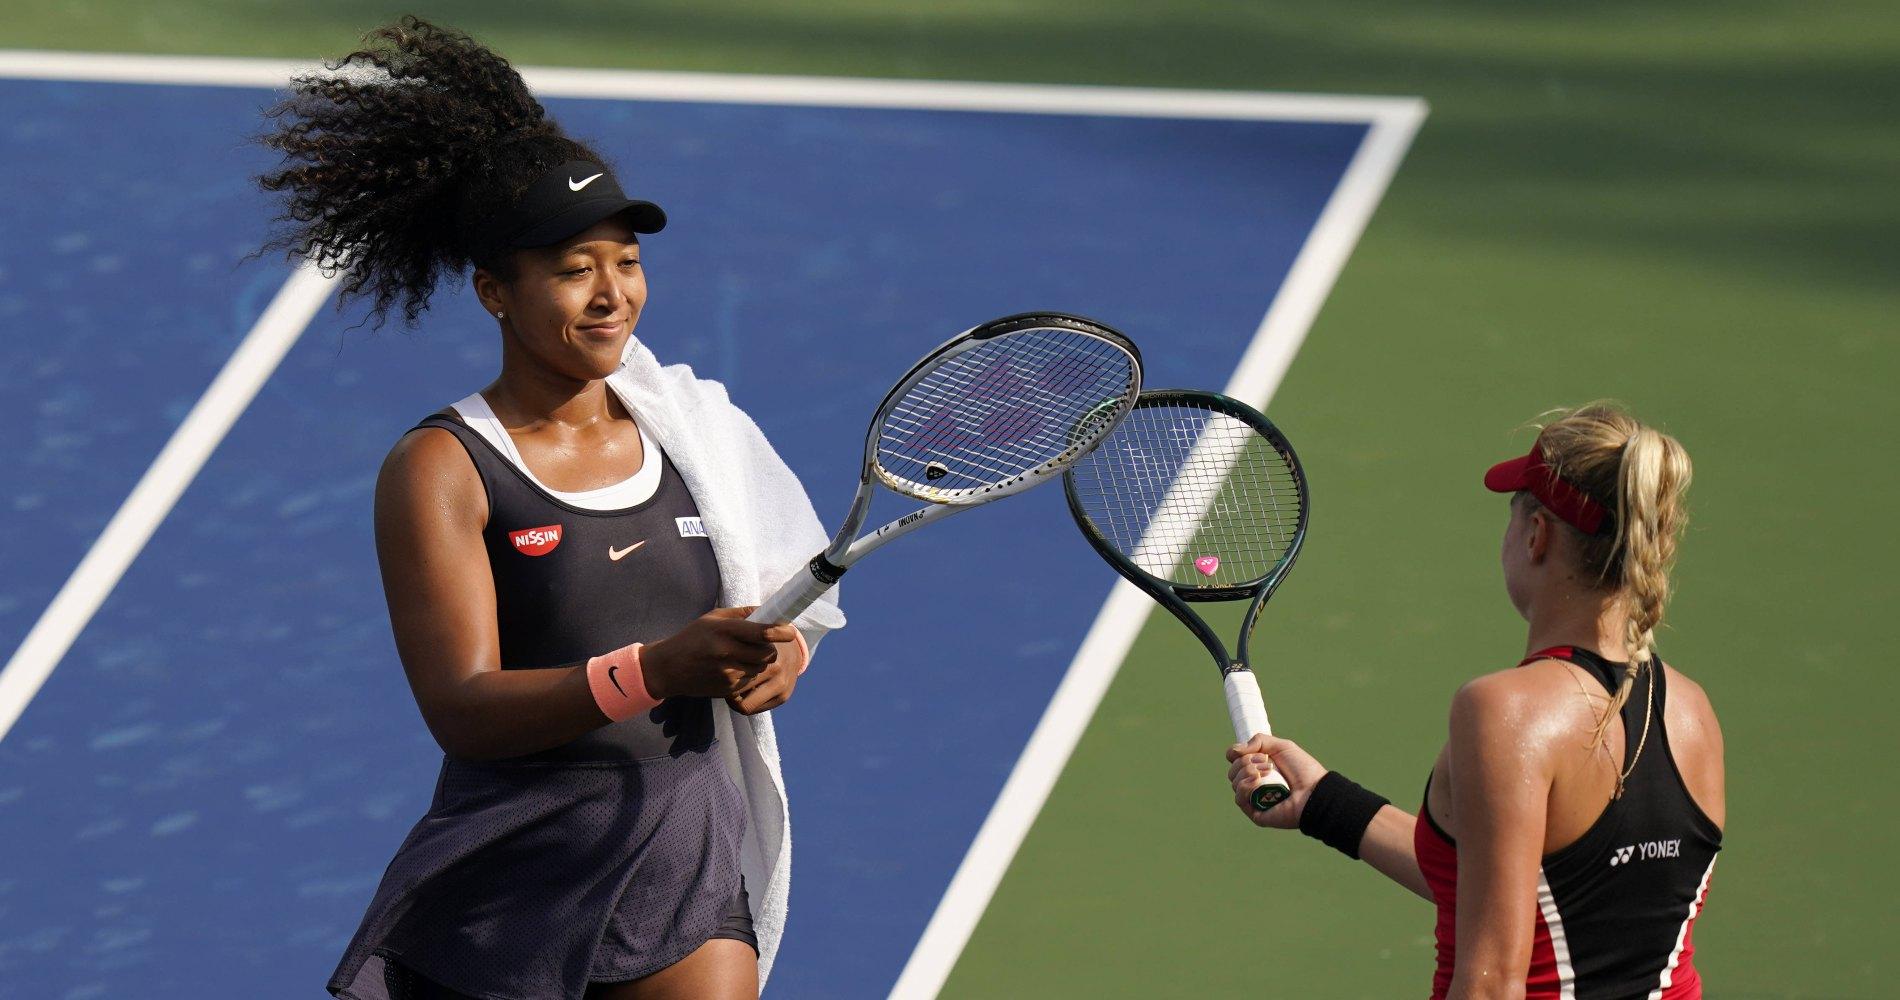 Naomi Osaka, Western & Southern Open (Flushing Meadows / New York), 2020